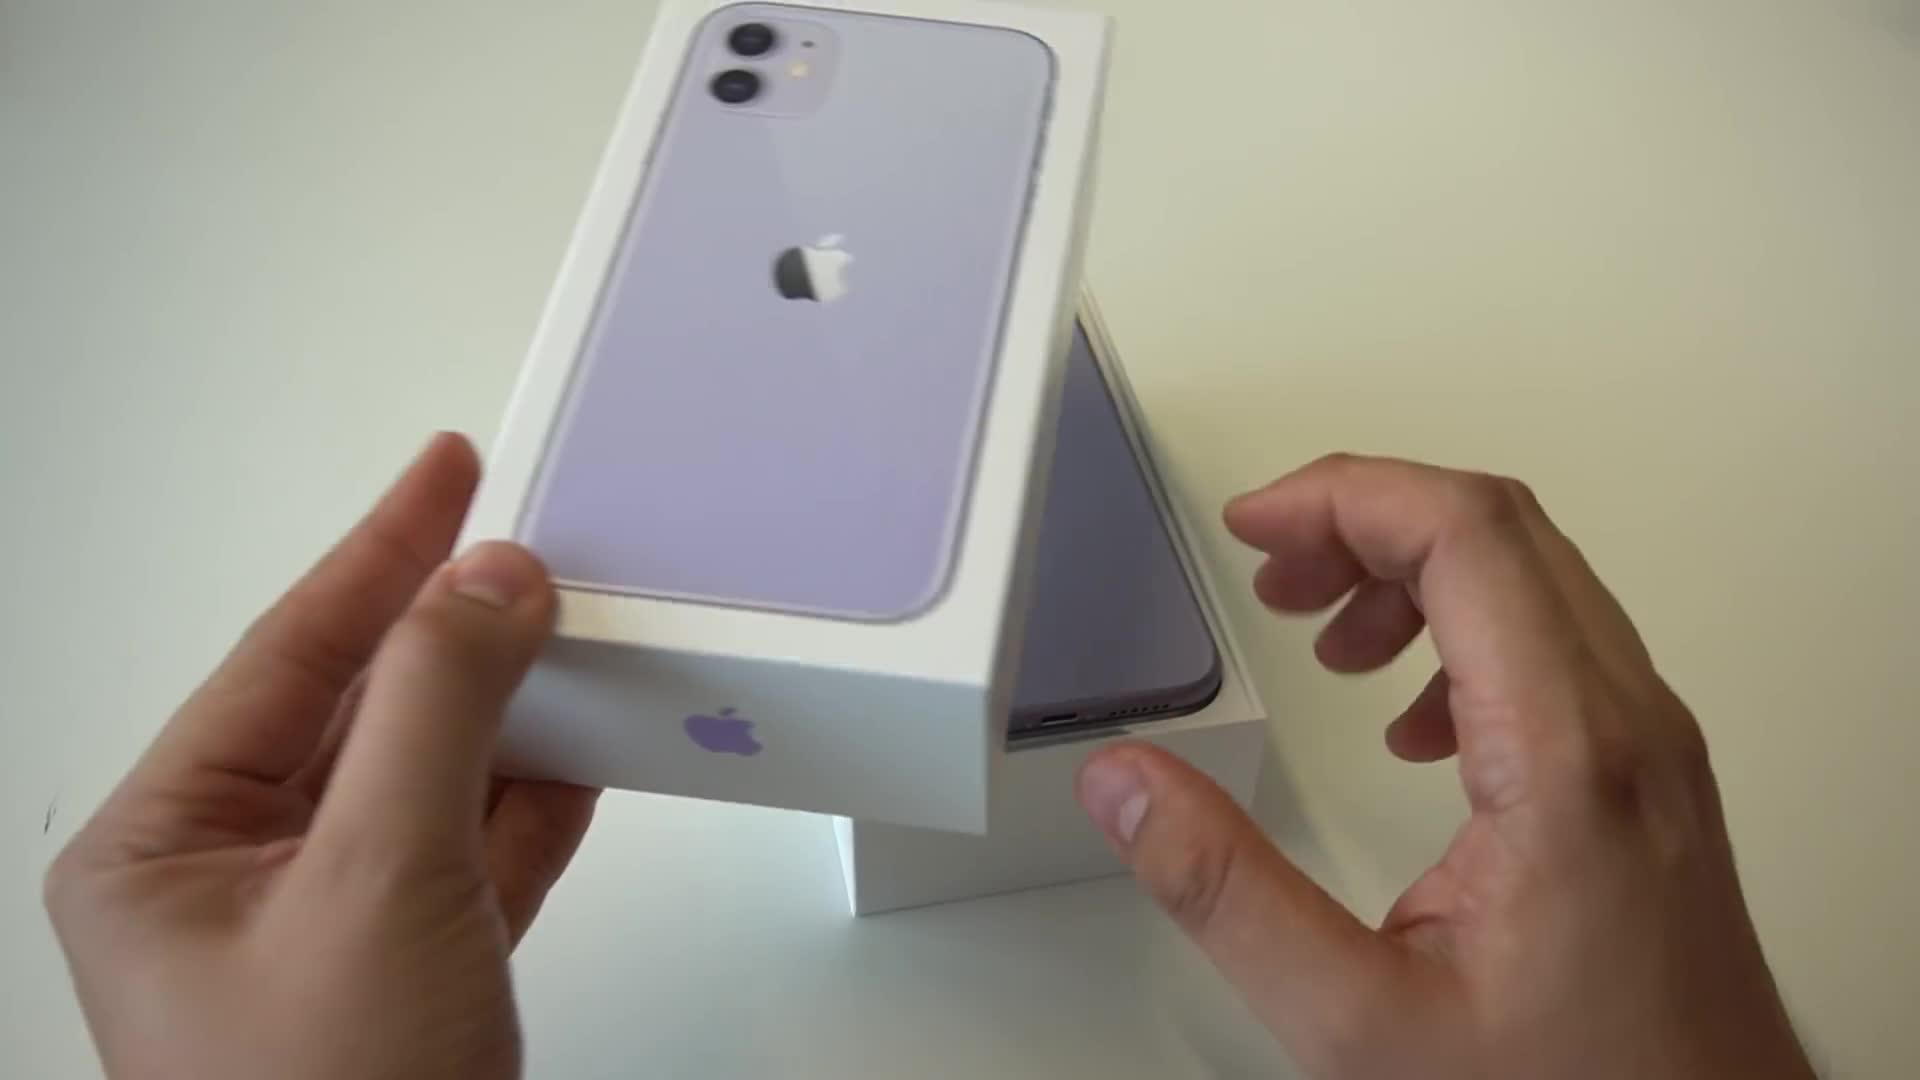 Smartphone, Apple, Iphone, NewGadgets, Johannes Knapp, Unboxing, iPhone 11, Apple iPhone 11